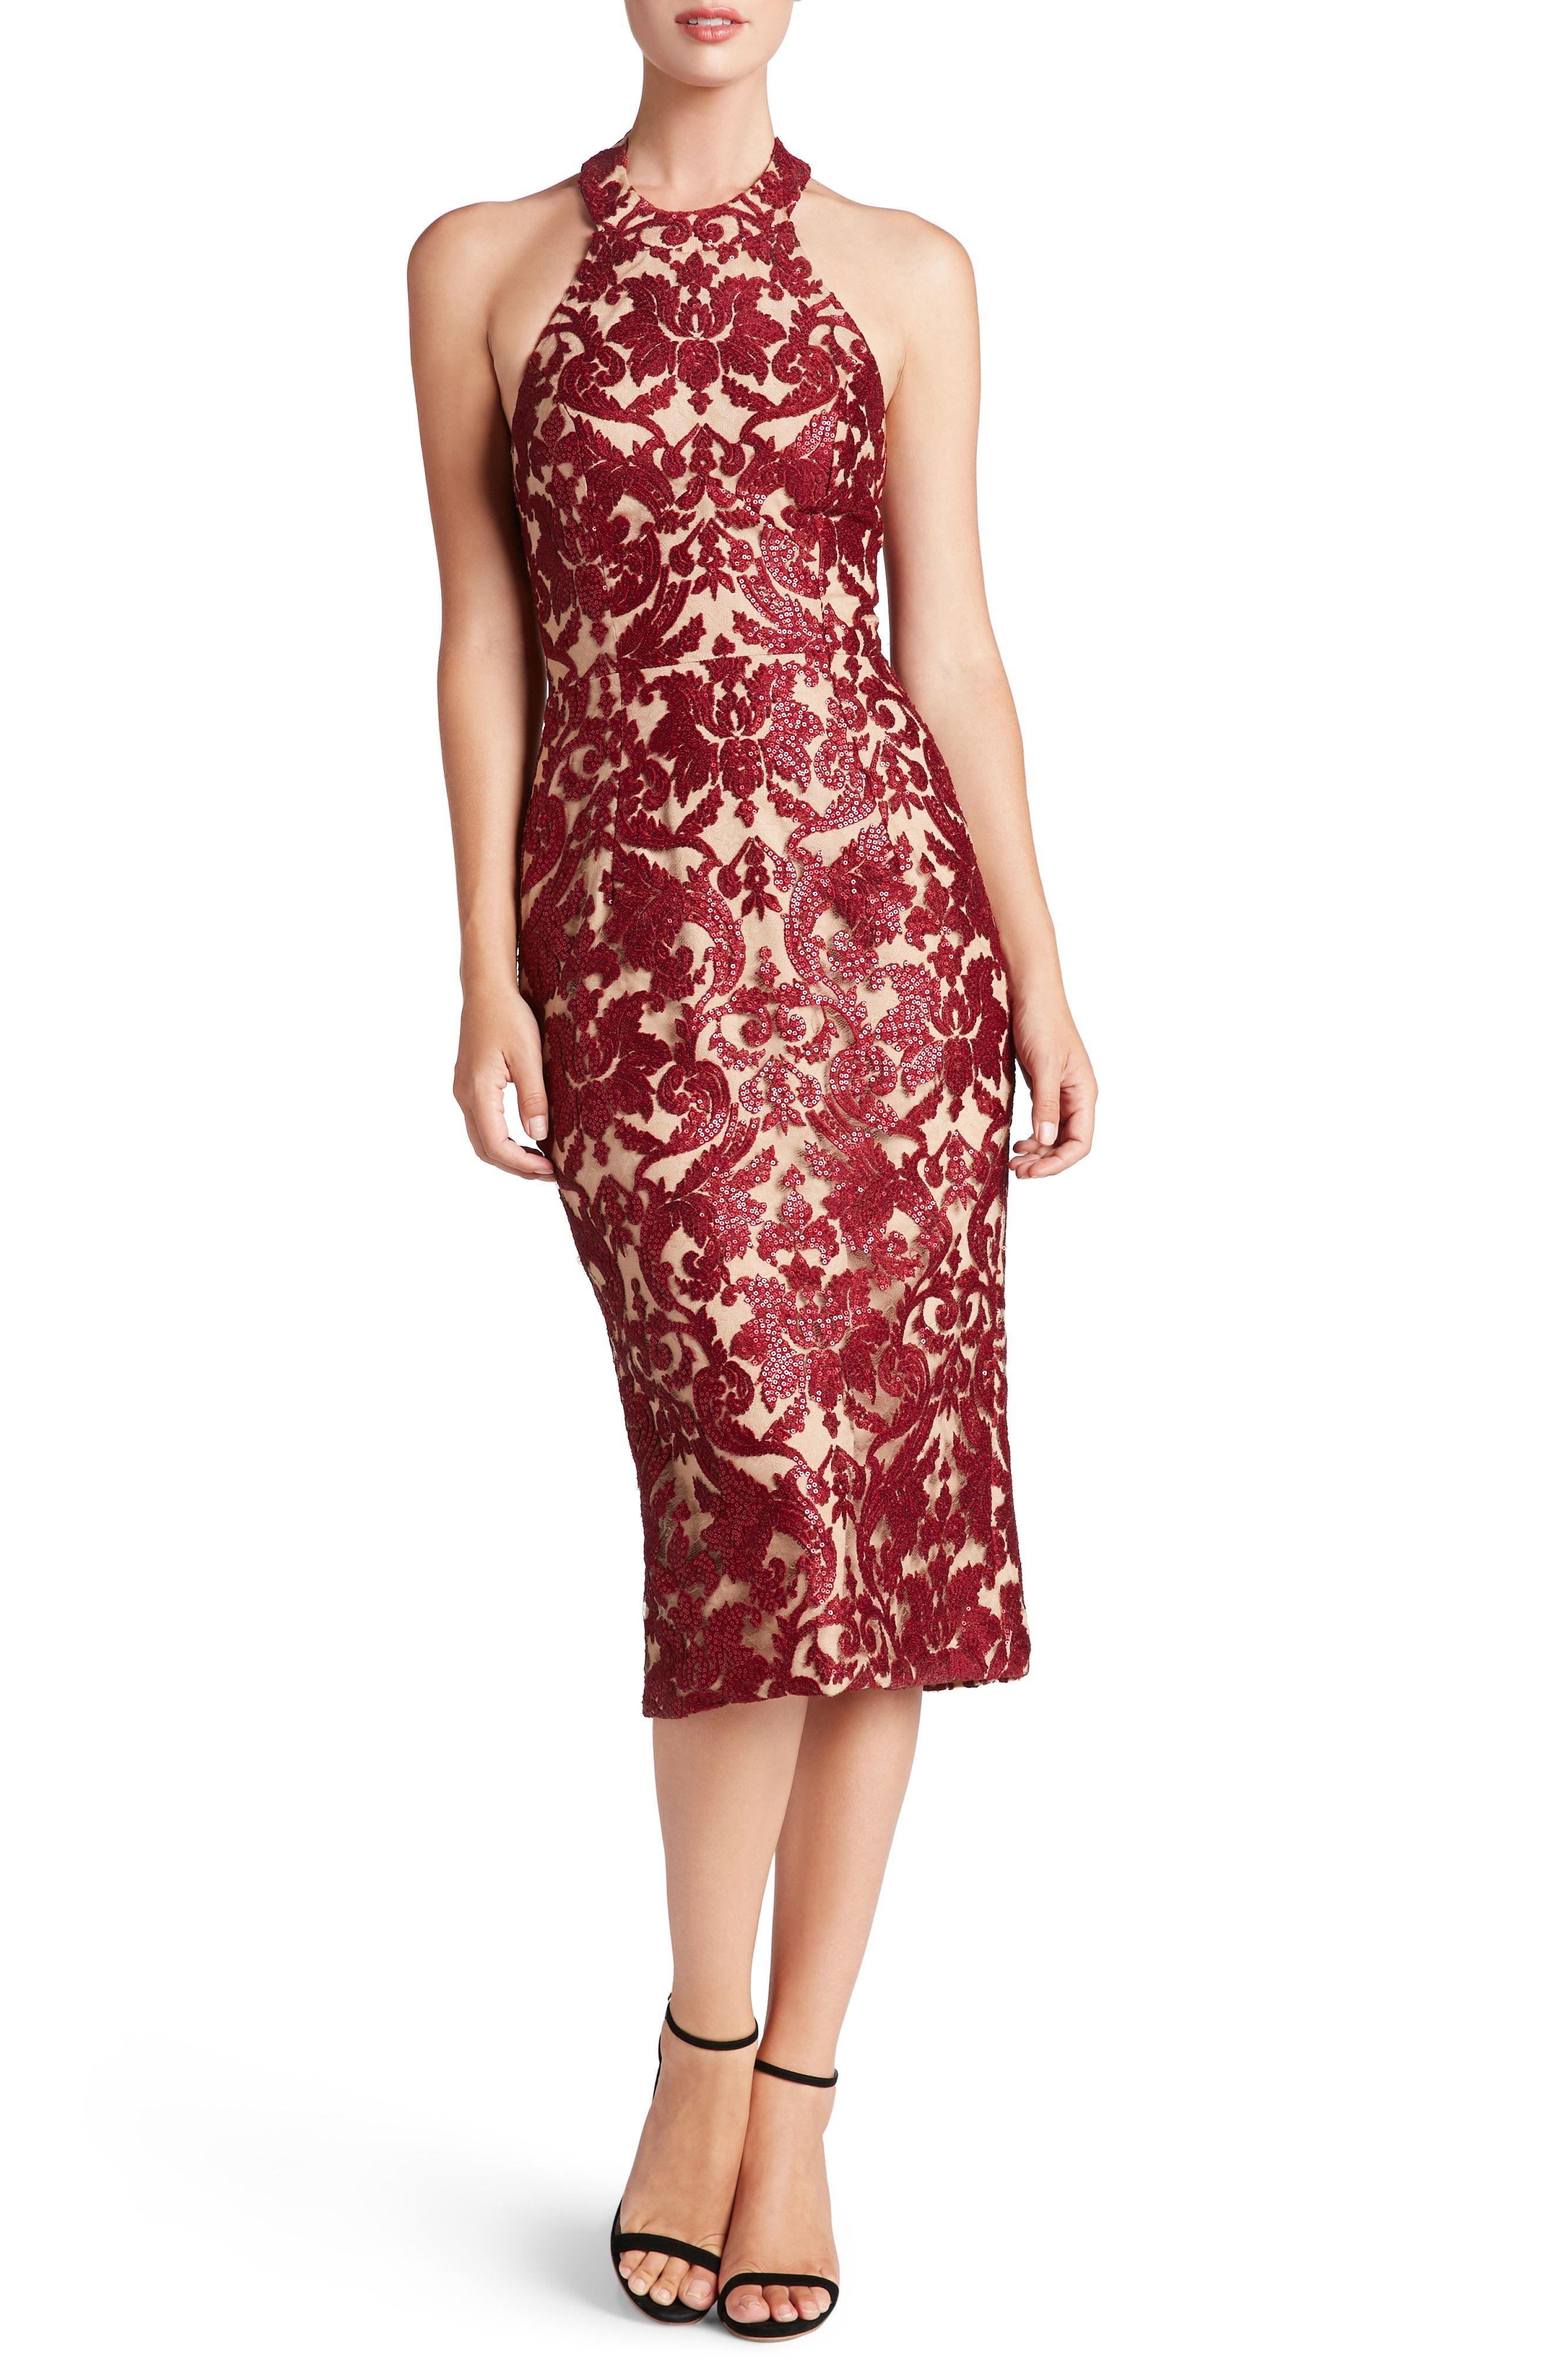 fb9b252364bb Wine colored lace midi dress -  ad -  dresses  style